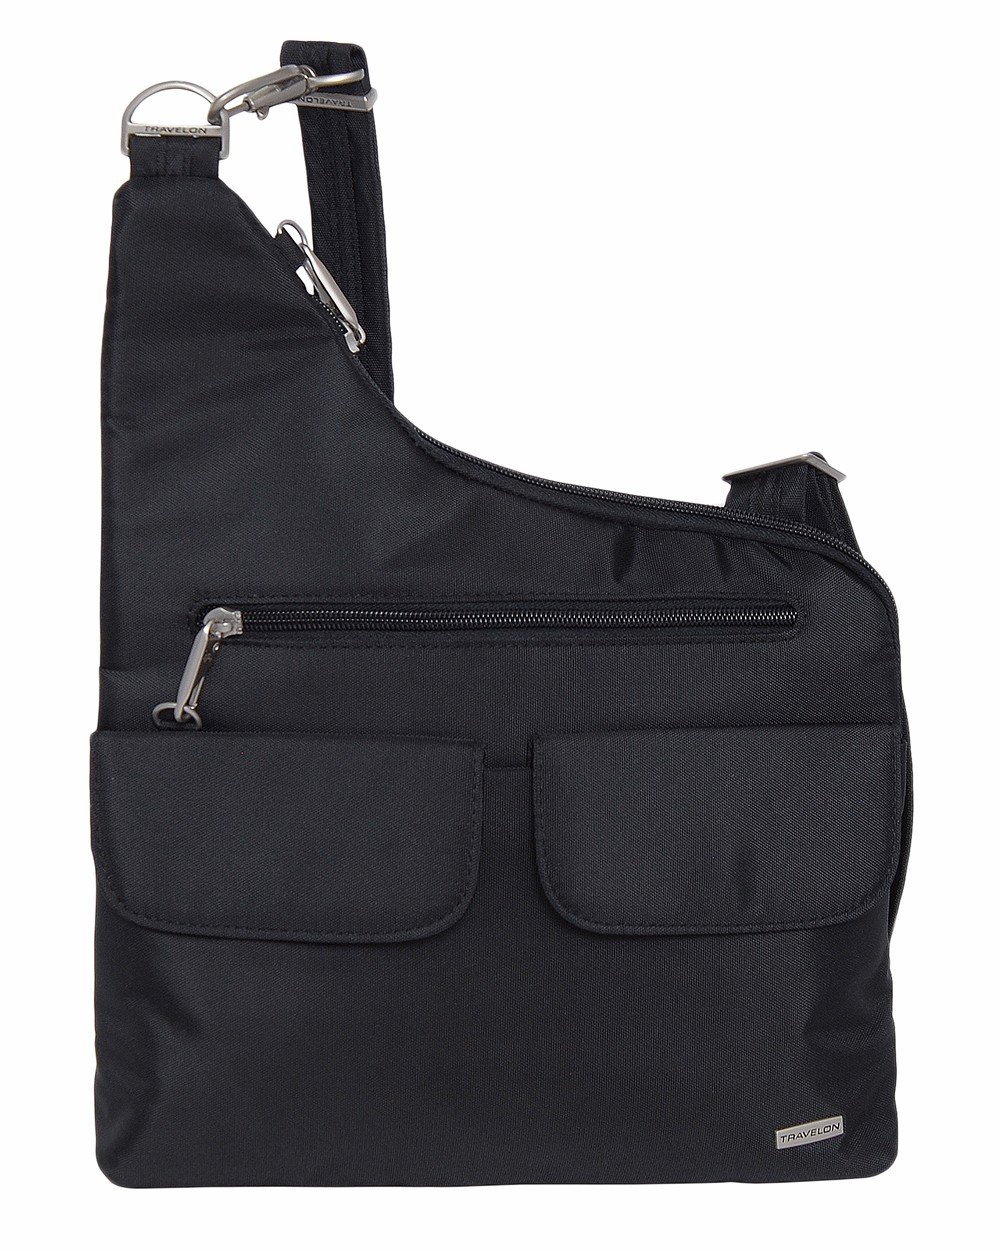 Travelon Anti-Theft Classic Crossbody Bucket Bag (One Size, Black w/Paisley Lining)